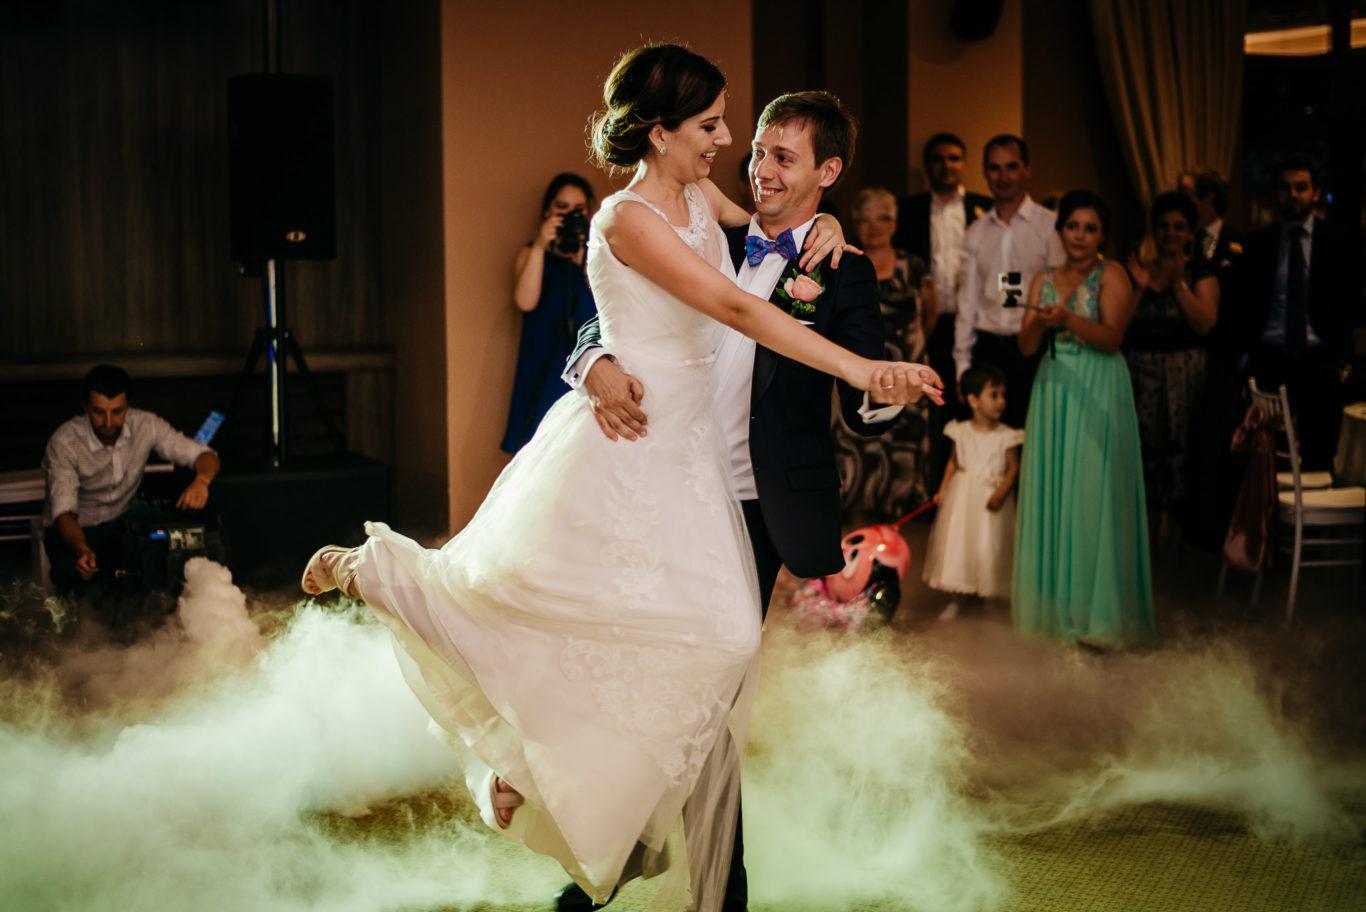 0567-Fotografie-nunta-Bucuresti-Oana-Catalin-fotograf-Ciprian-Dumitrescu-DSC_4728